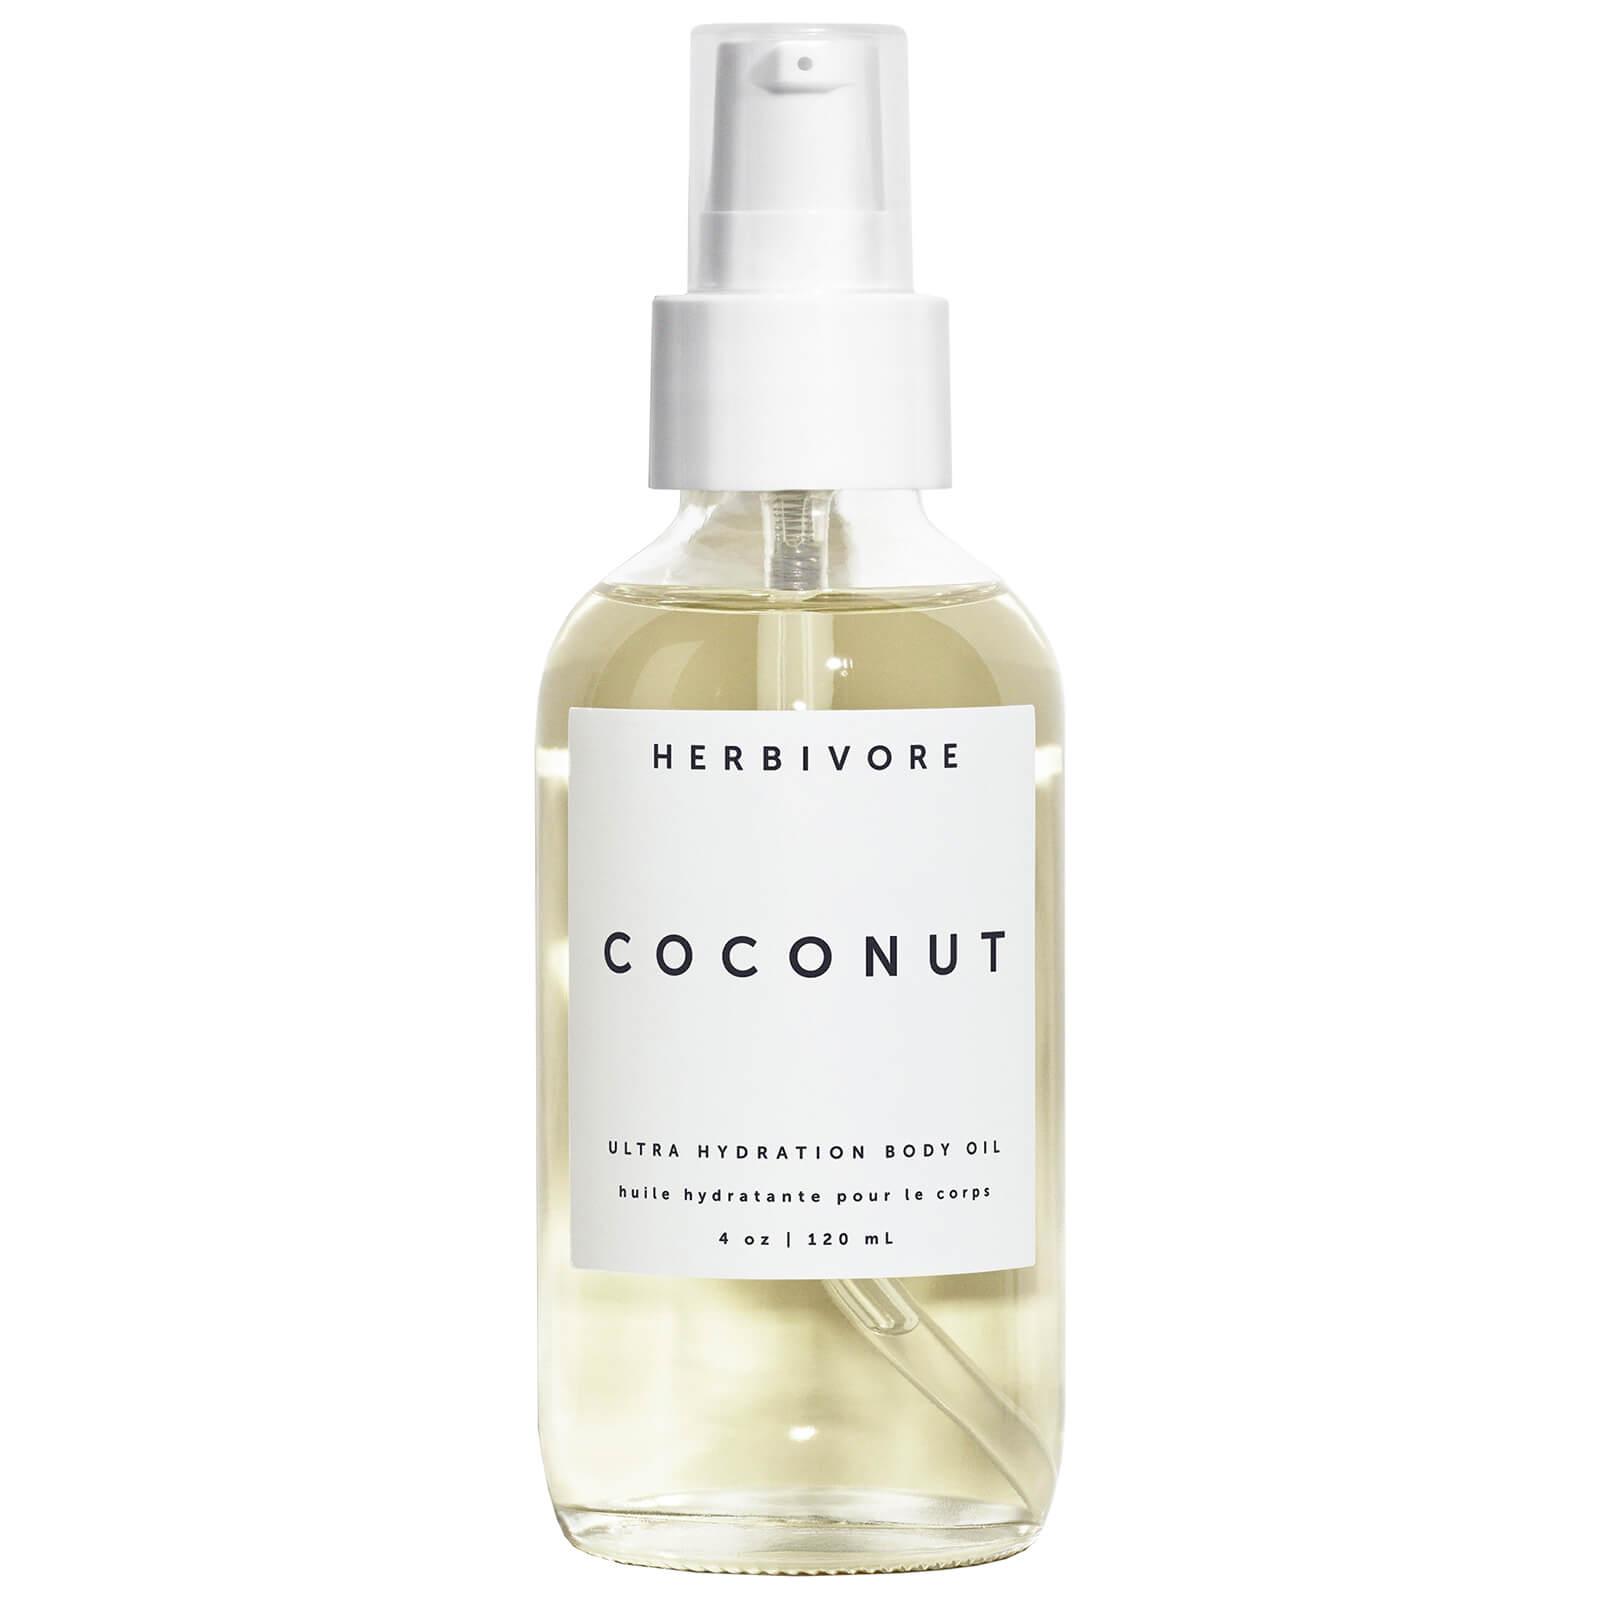 Herbivore Coconut Body Oil